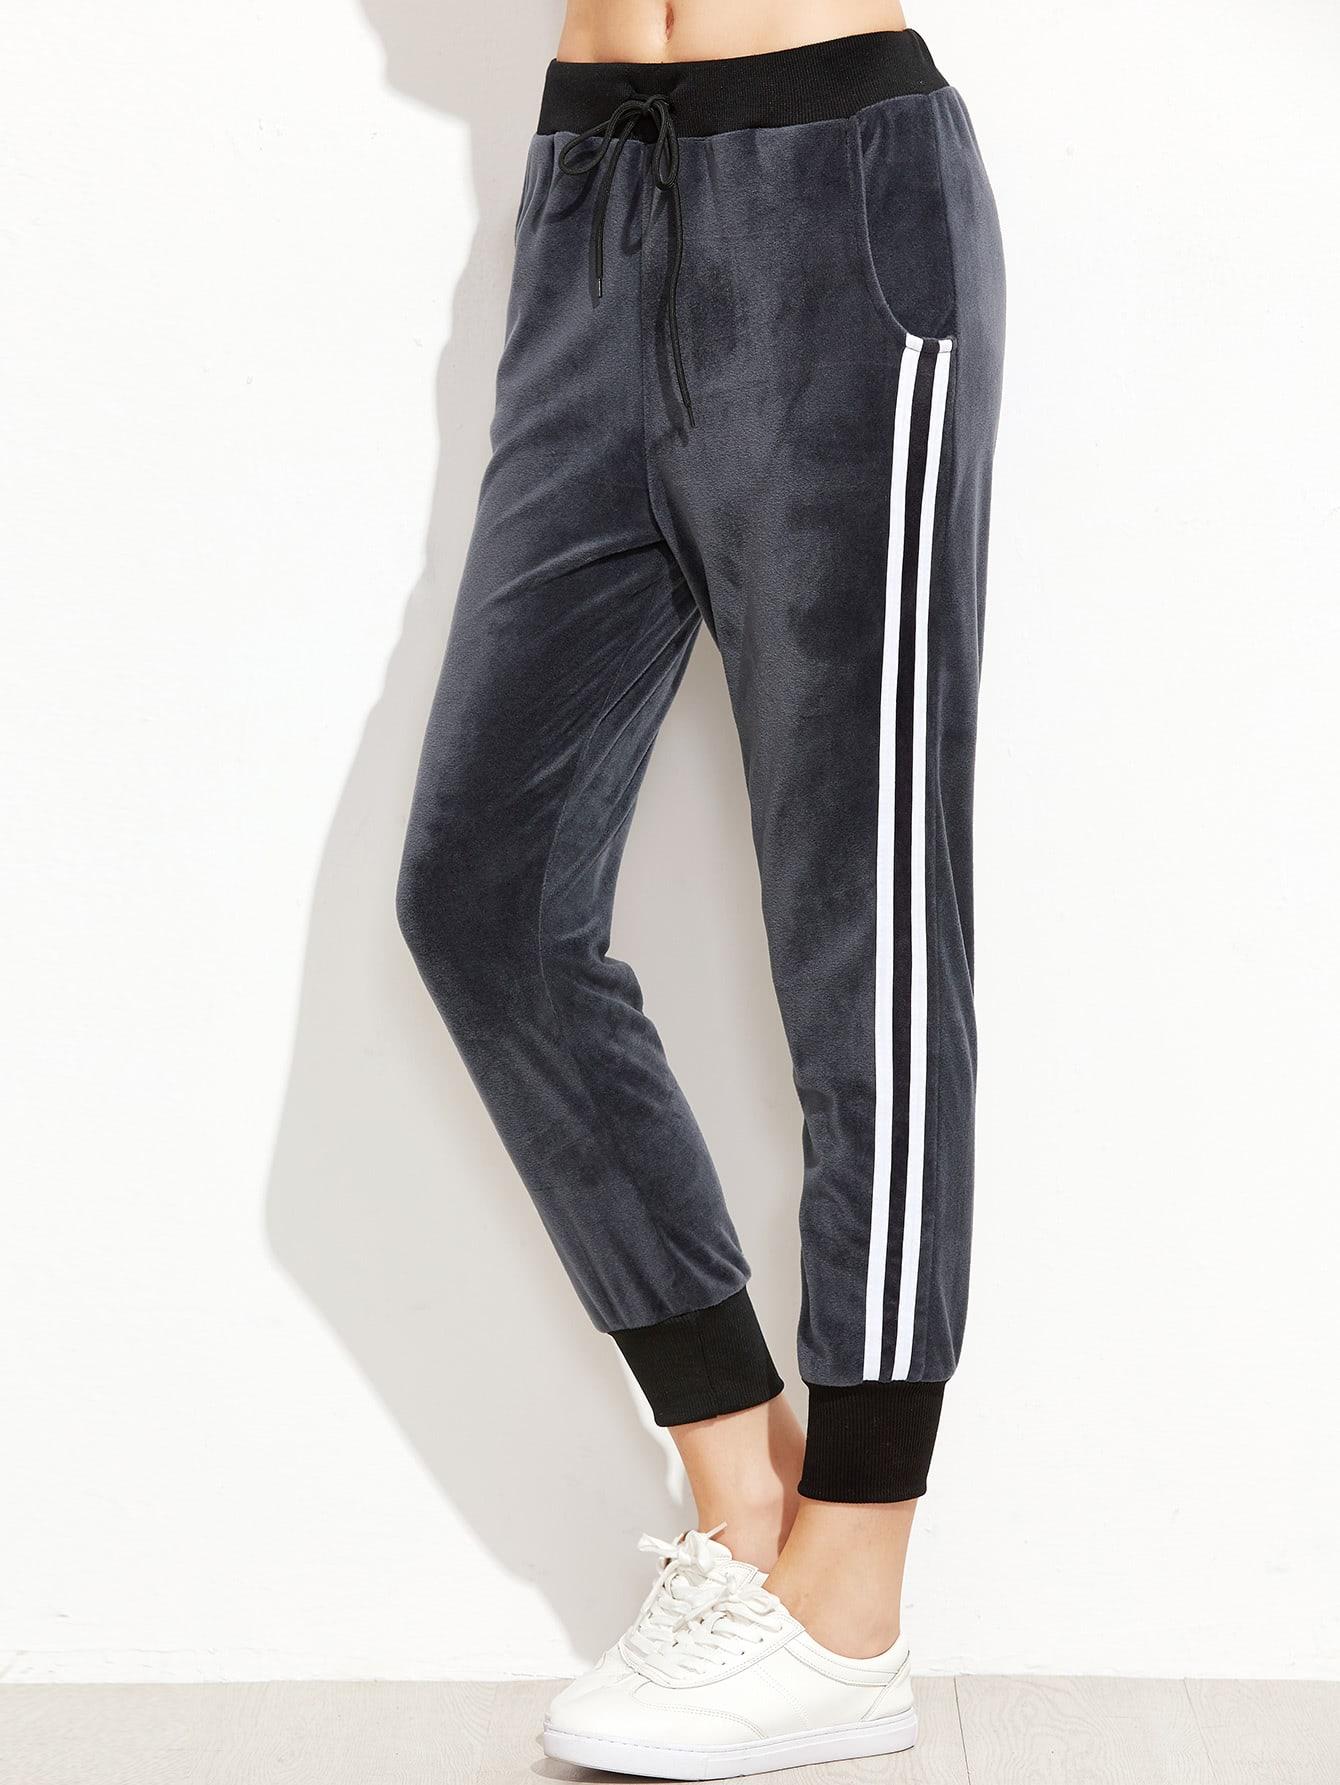 Dark Grey Ribbed Trim Striped Side Velvet Pants pants161013102